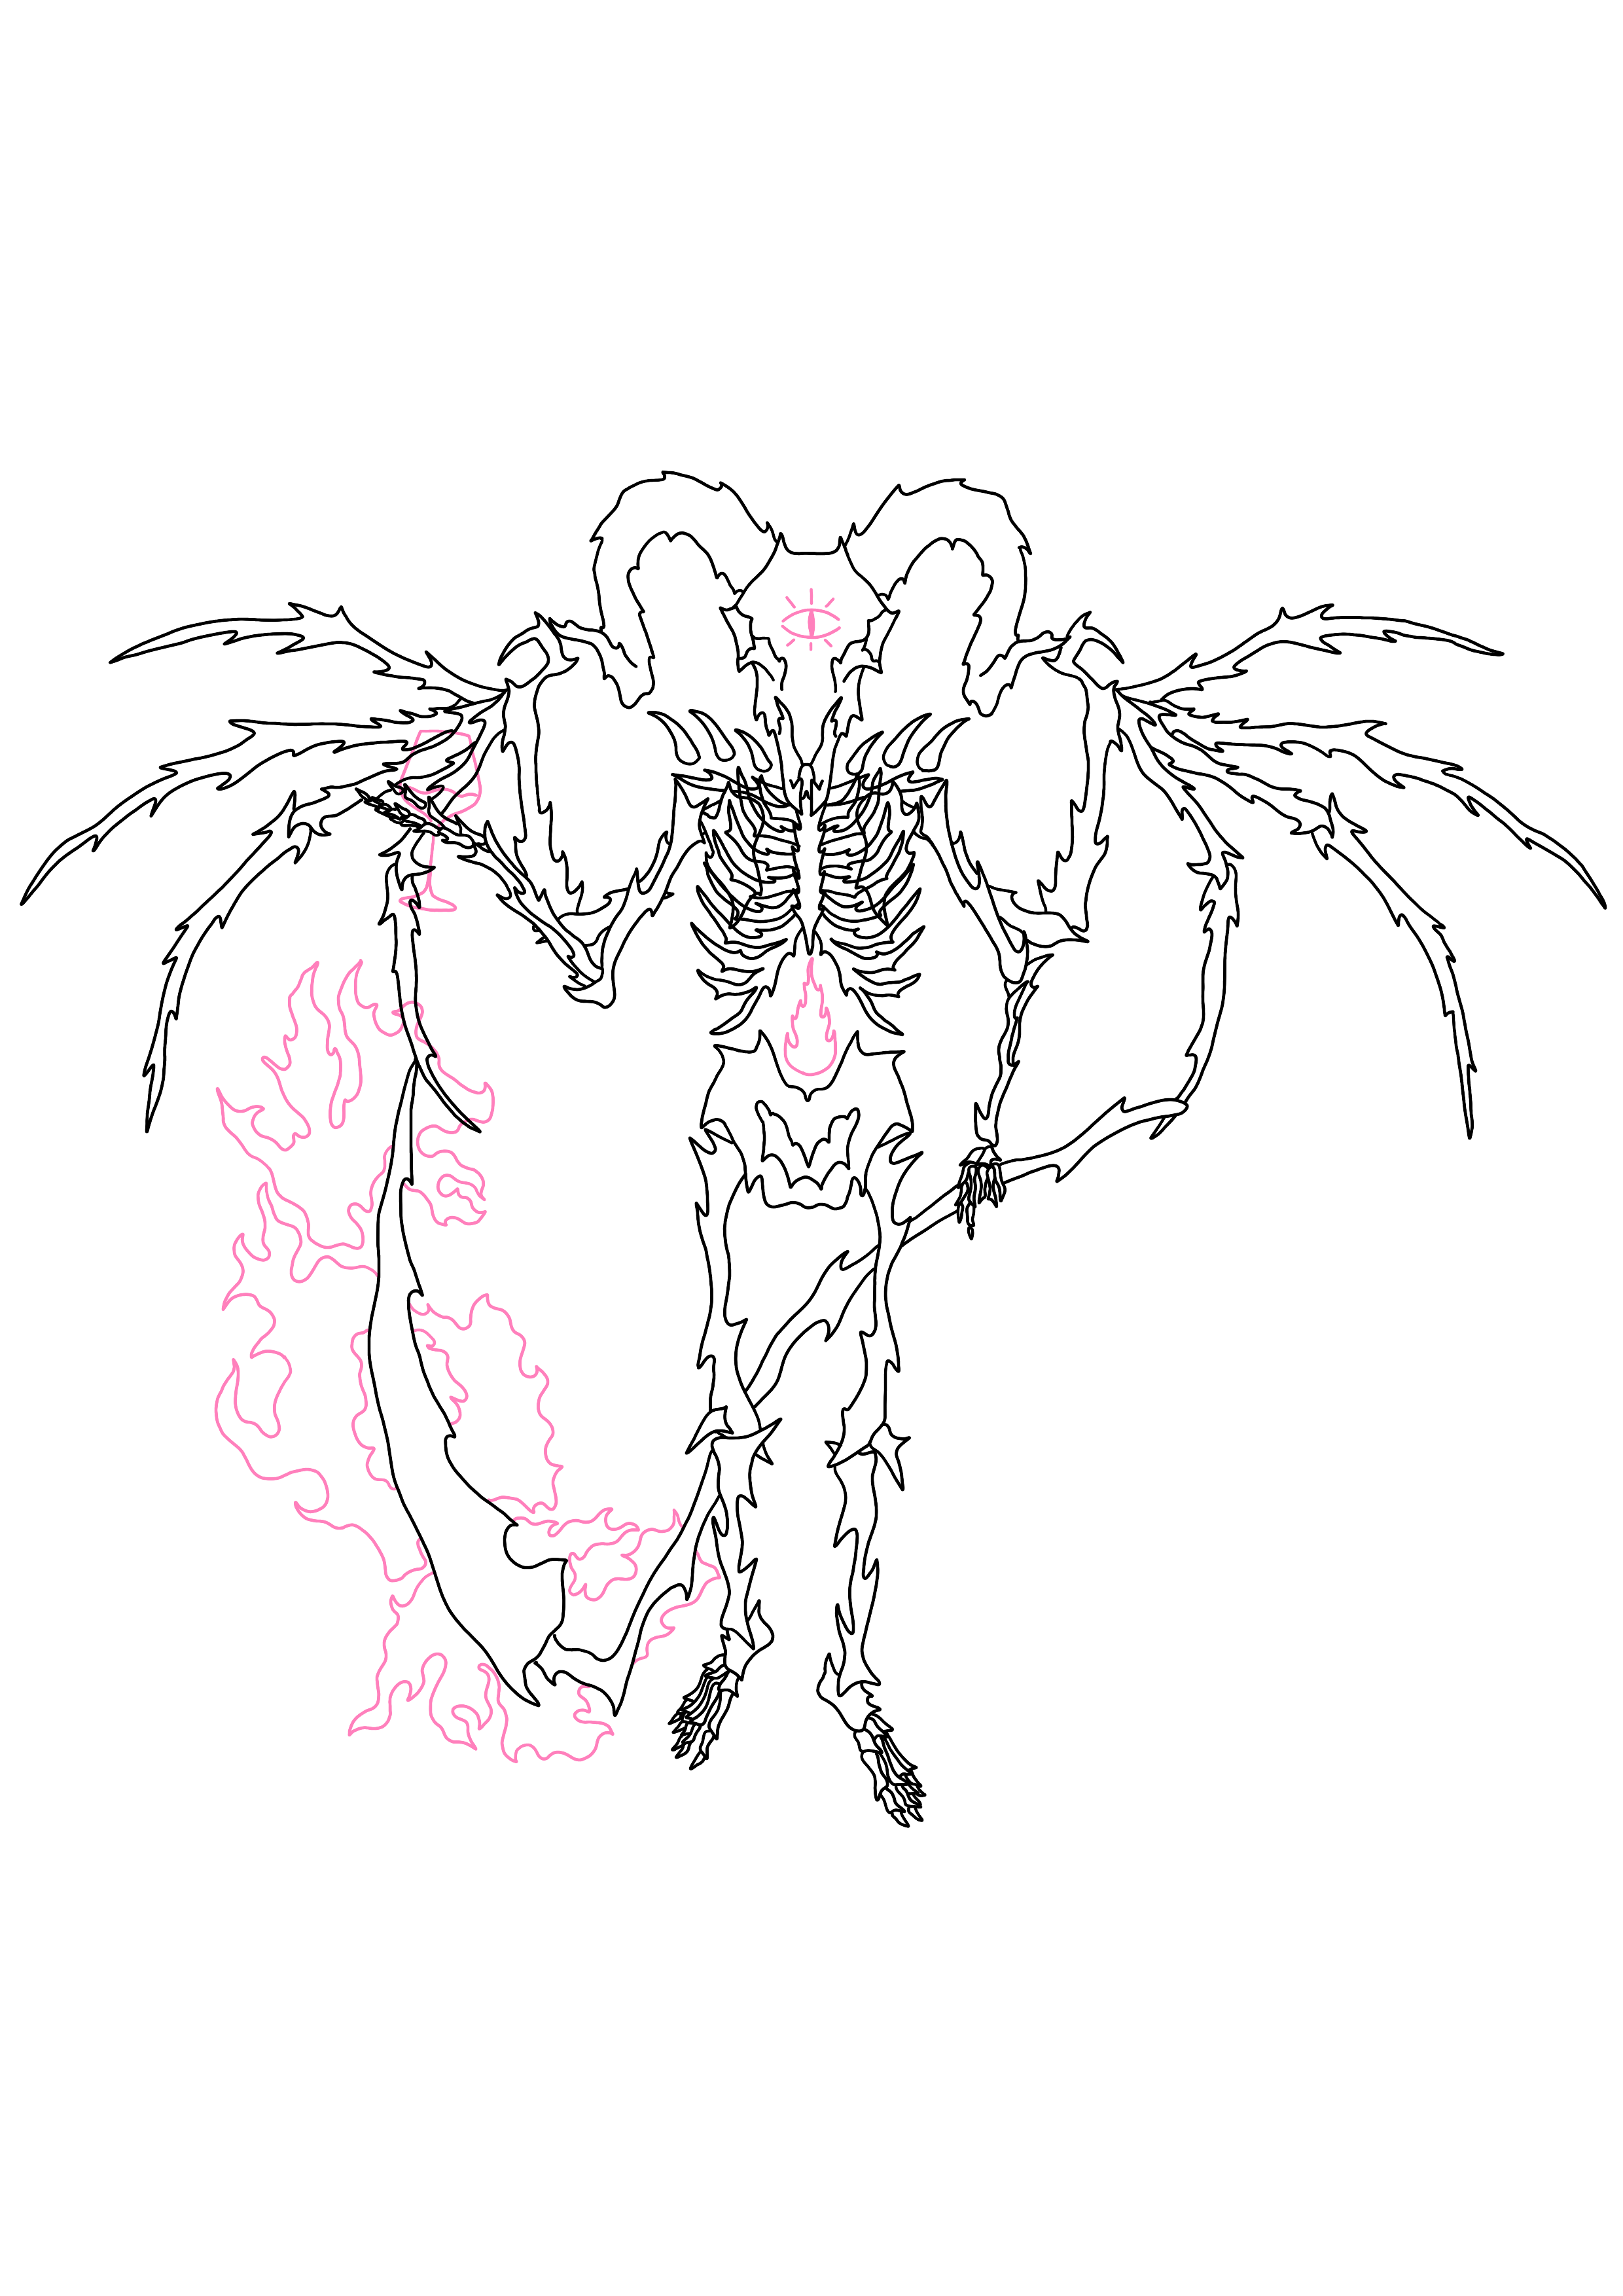 Inksearch tattoo Sexoskeleton